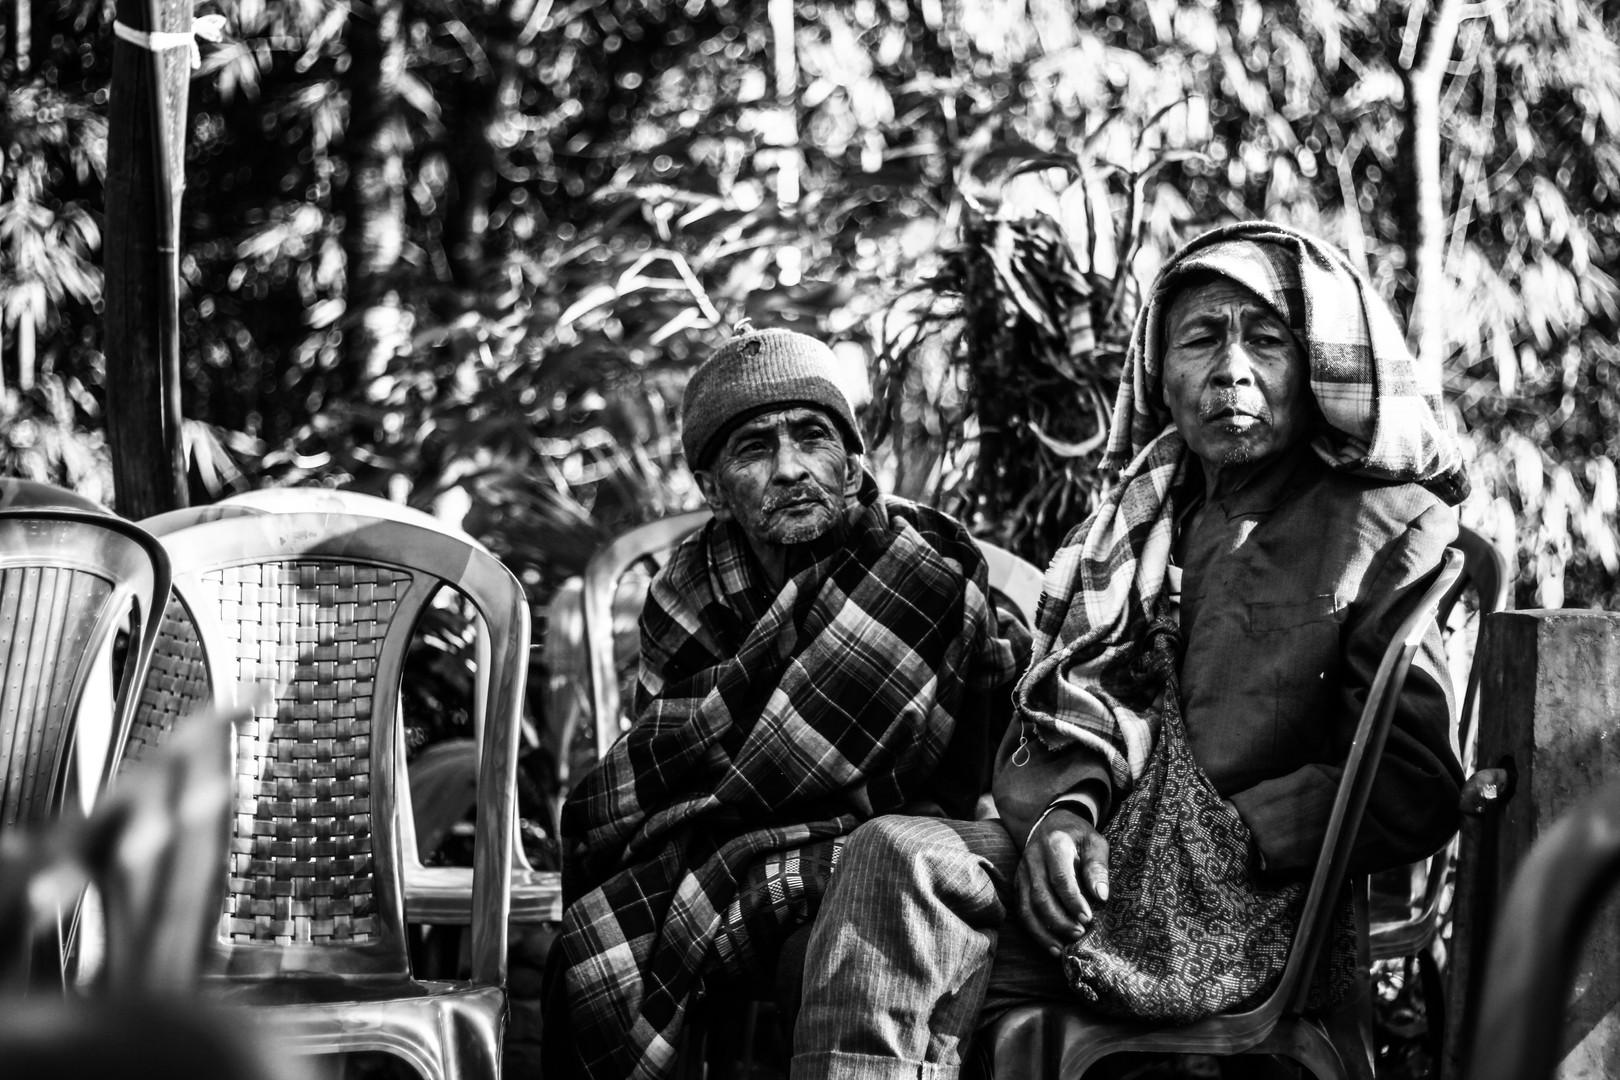 Patience | Meghalaya, 2017